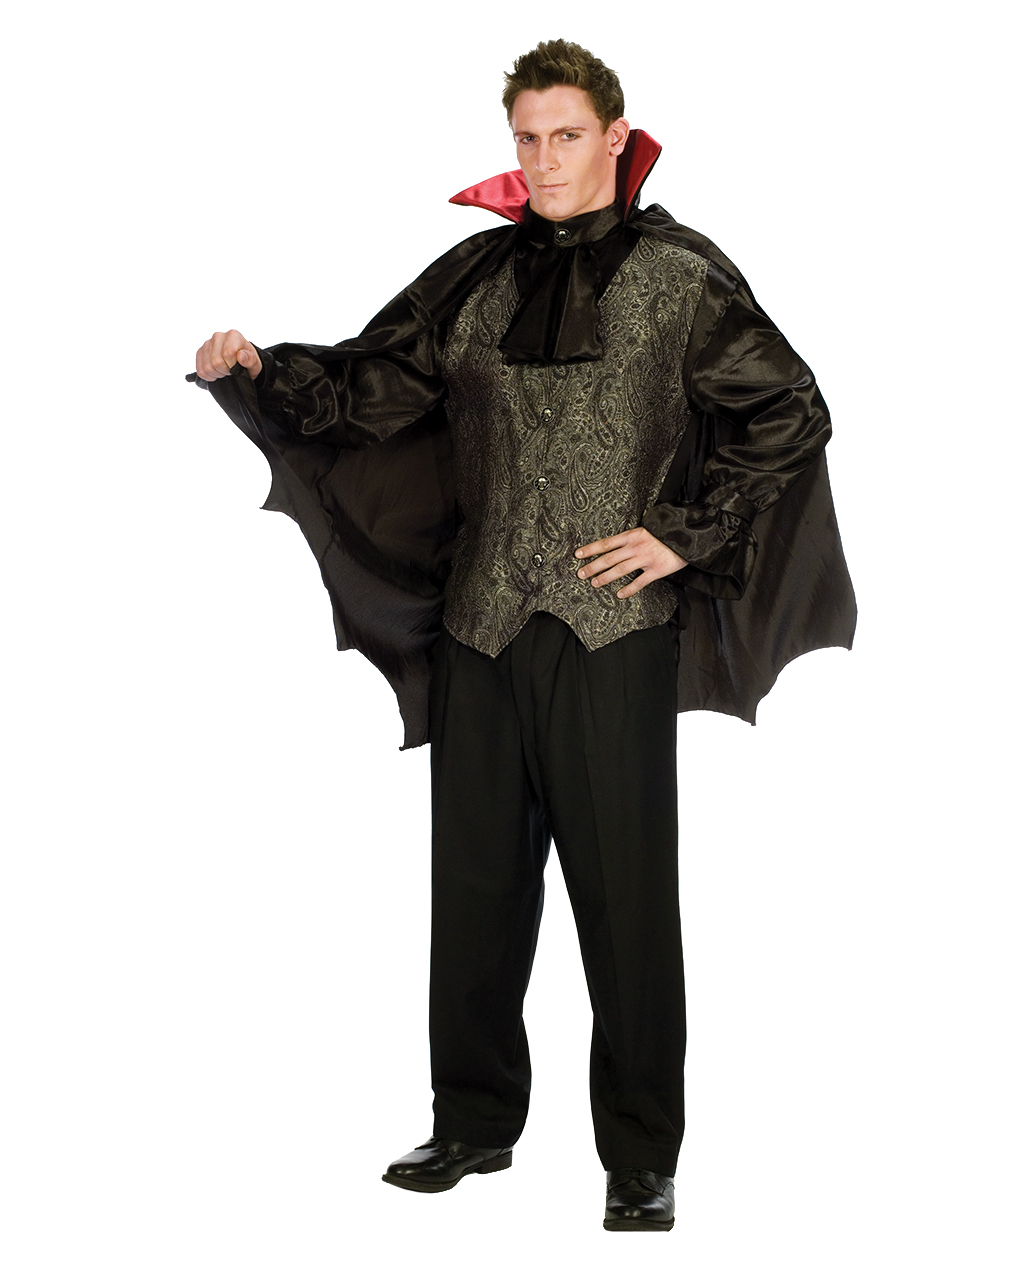 graf edel vampir kost m vampirkost me g nstig bestellen horror. Black Bedroom Furniture Sets. Home Design Ideas